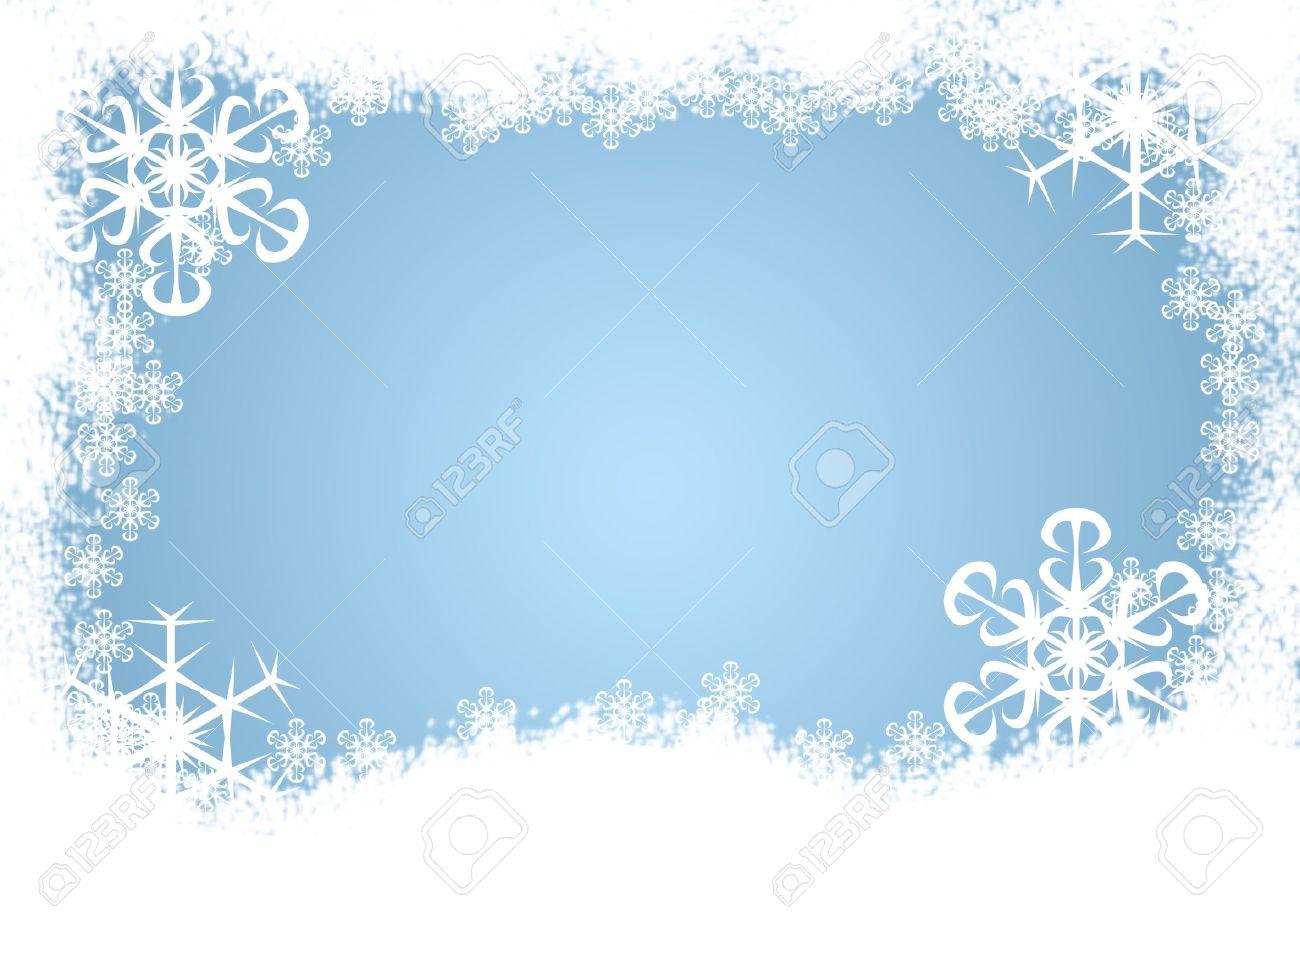 Download Winter Snow Borders .-Download Winter Snow Borders .-2